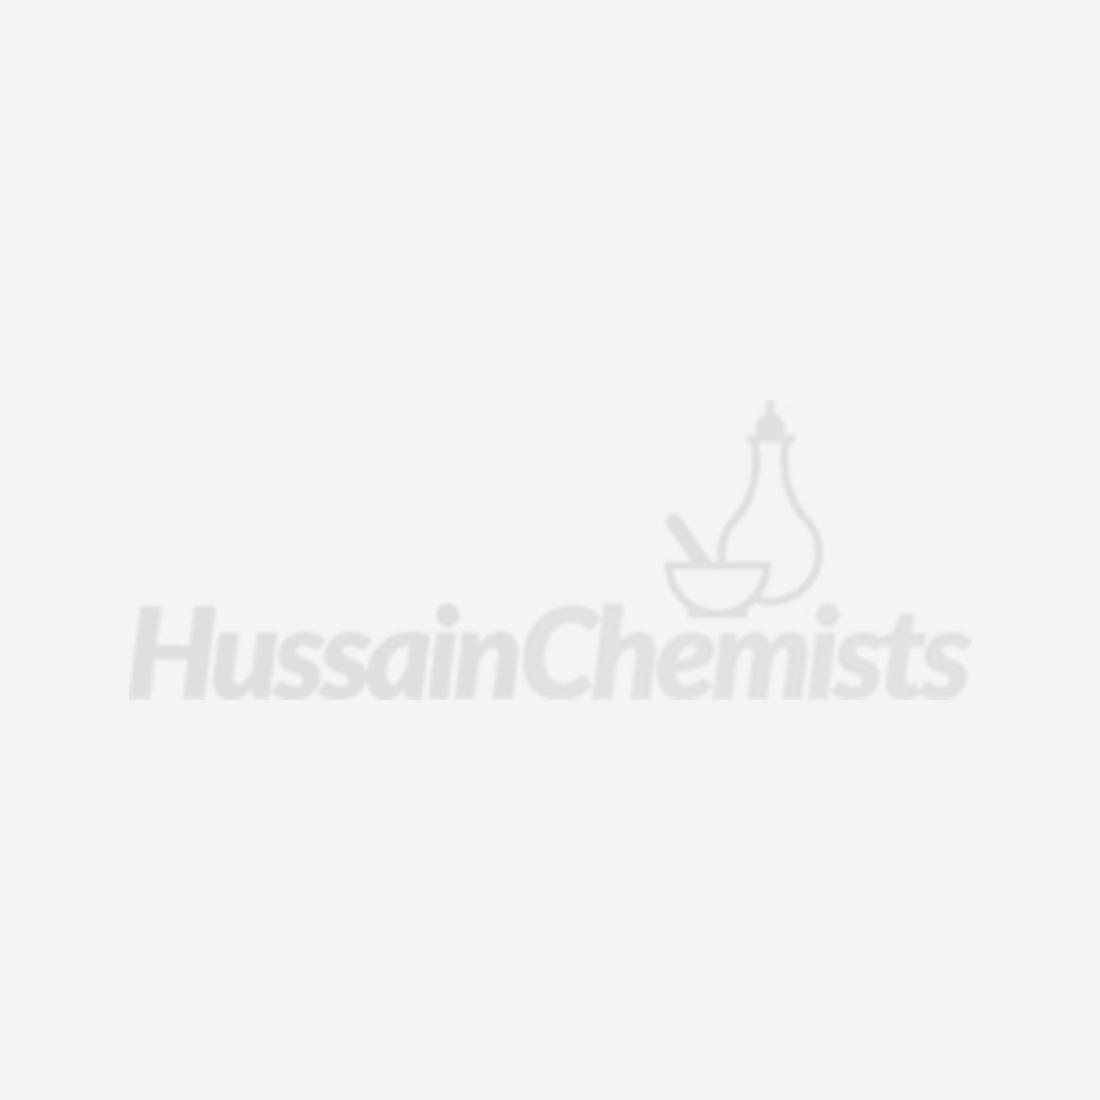 Anadin Extra Aspirin, Paracetamol & Caffeine 8 Caplets